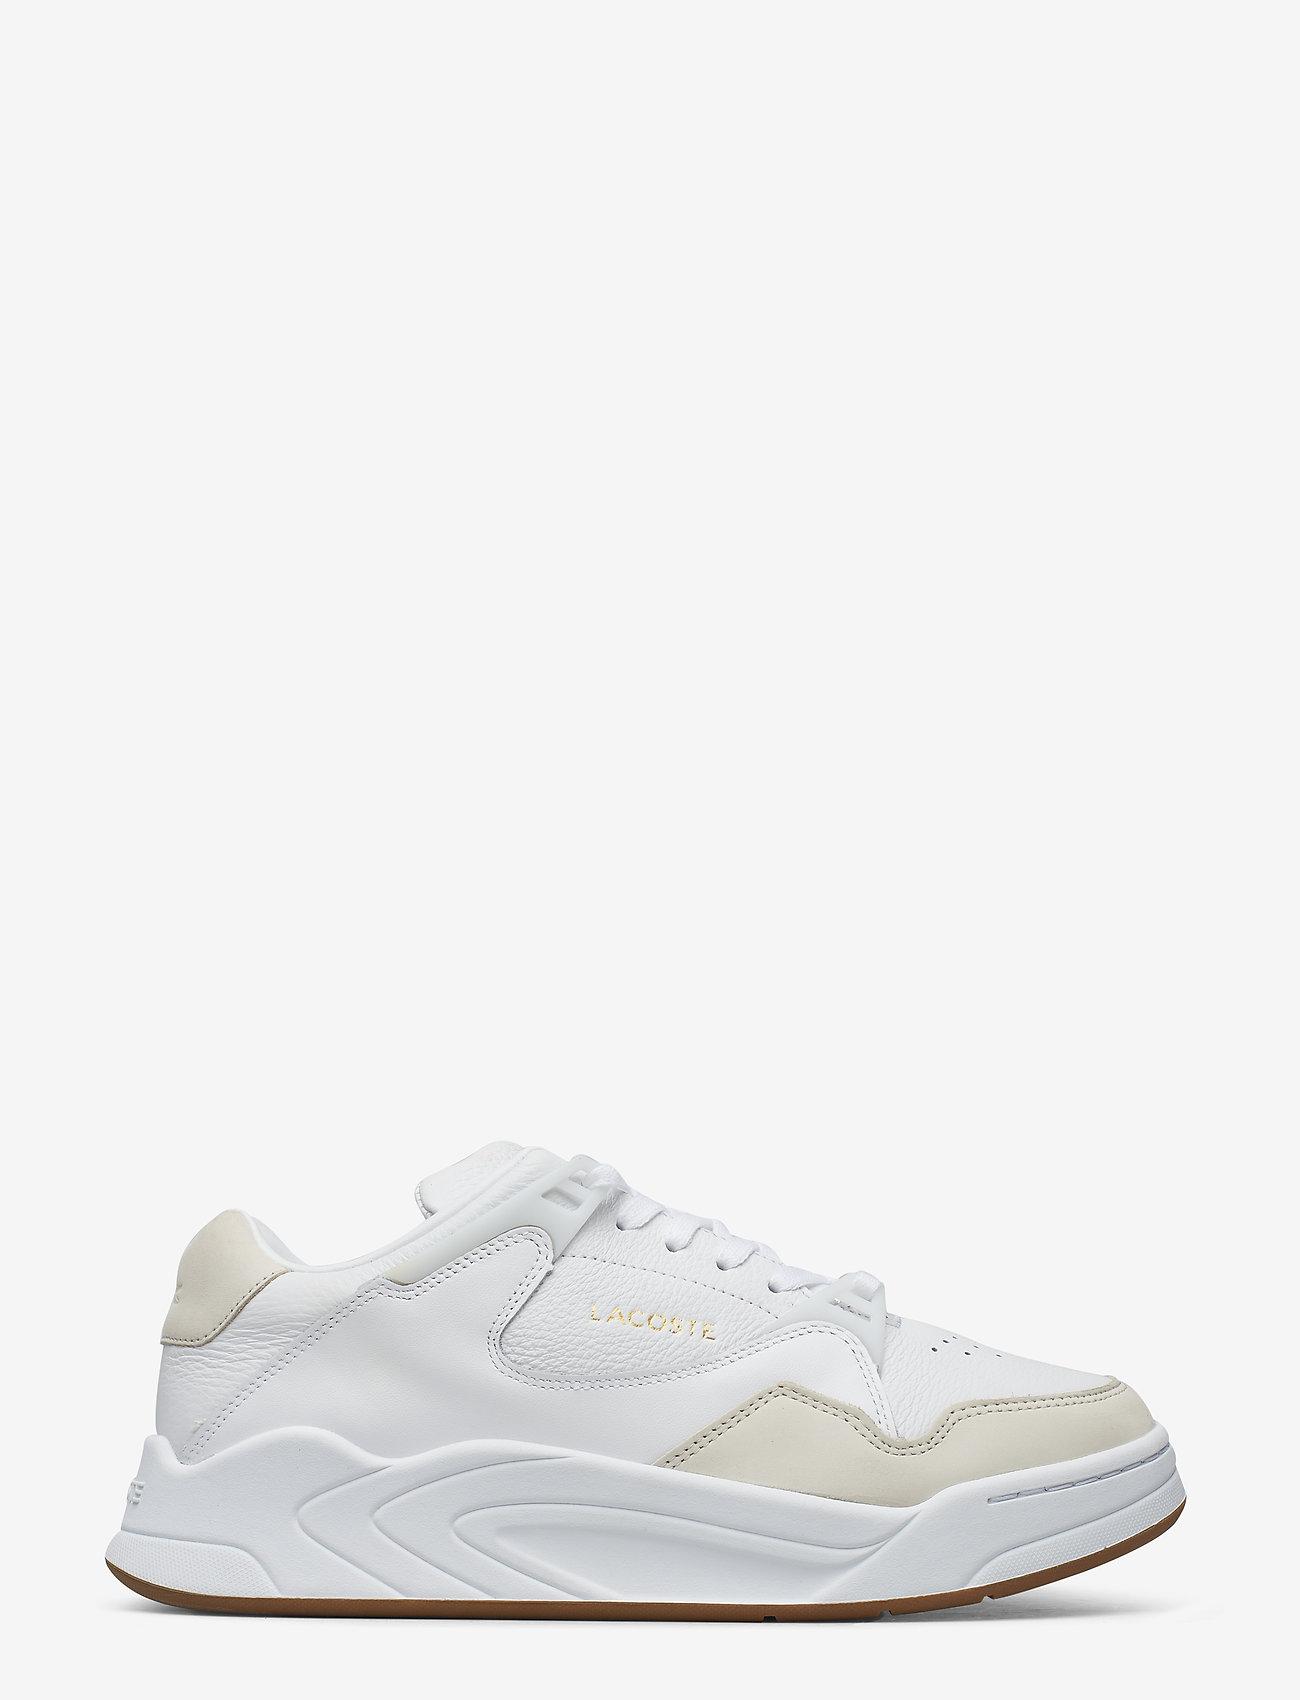 Lacoste Shoes - COURT SLAM 319 1 SMA - matalavartiset tennarit - wht/gum lth